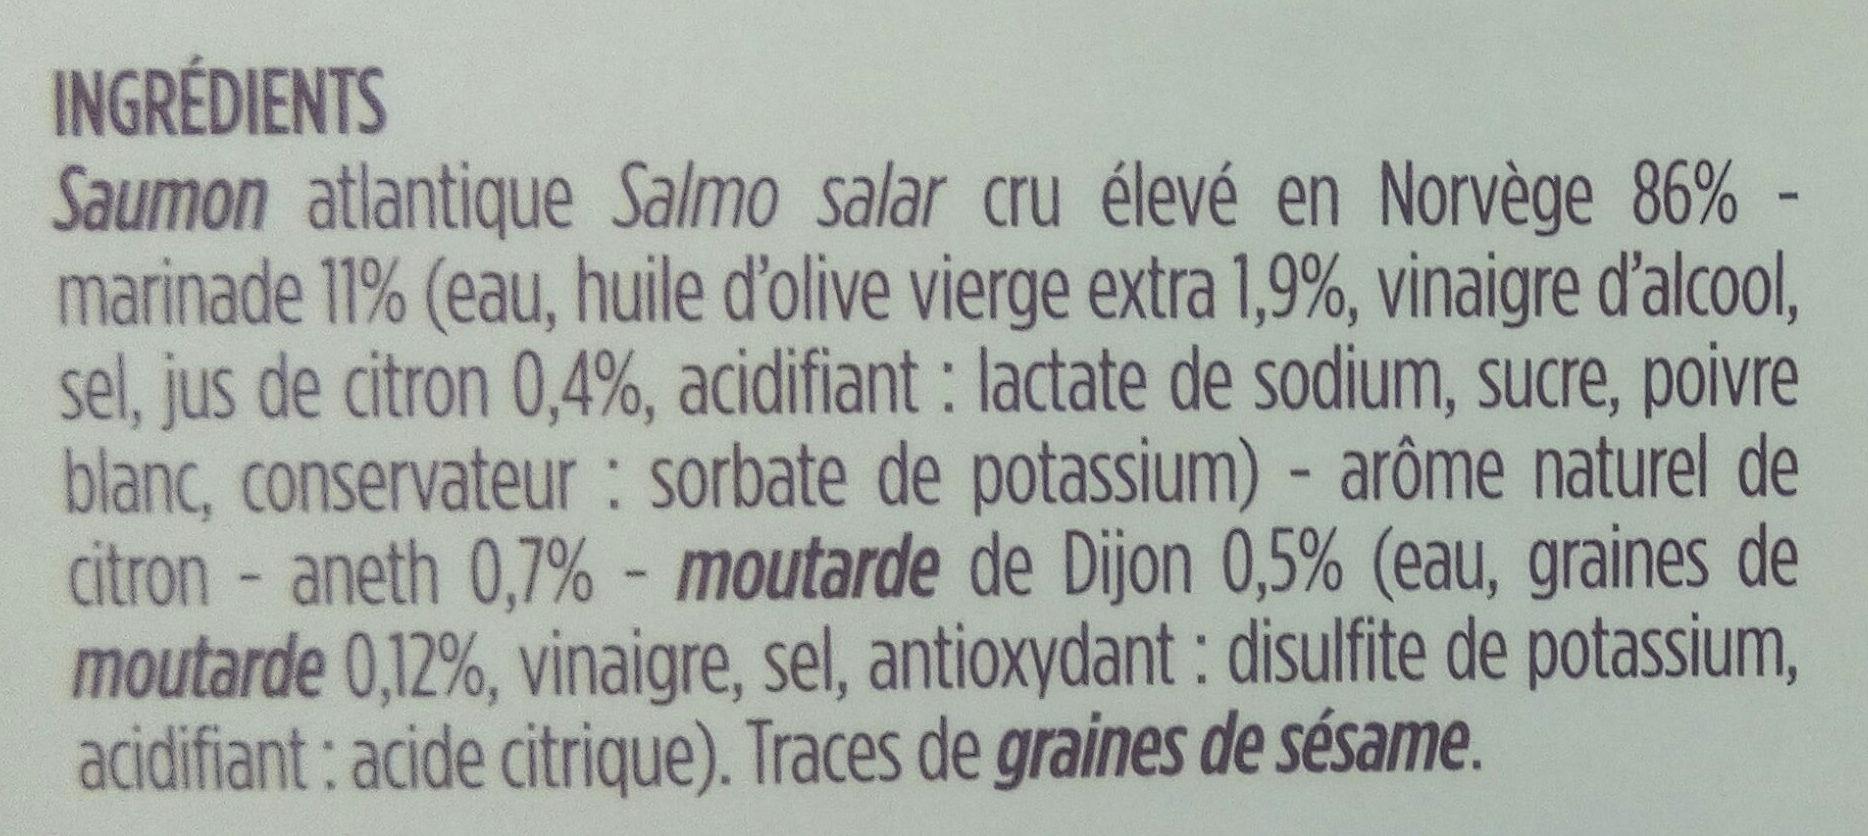 Tartare de saumon cru - Ingrédients - fr